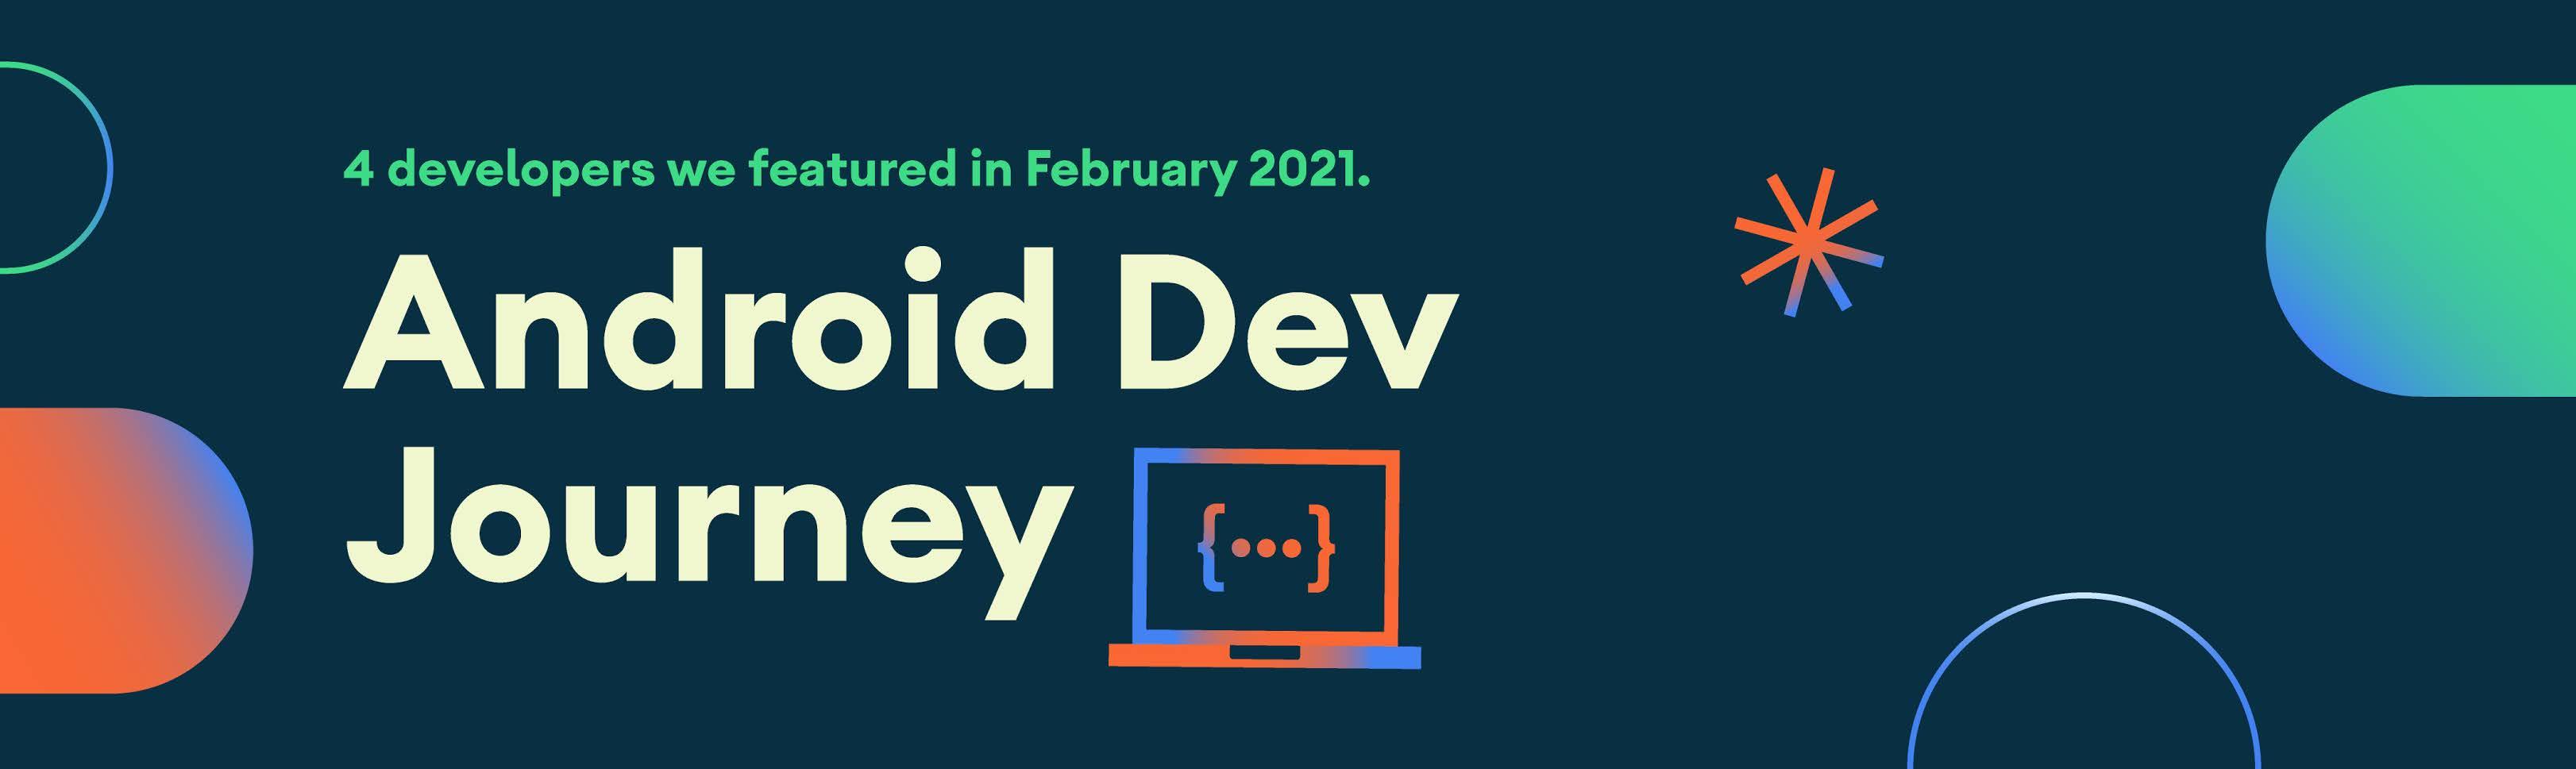 Android Dev Journey February Header